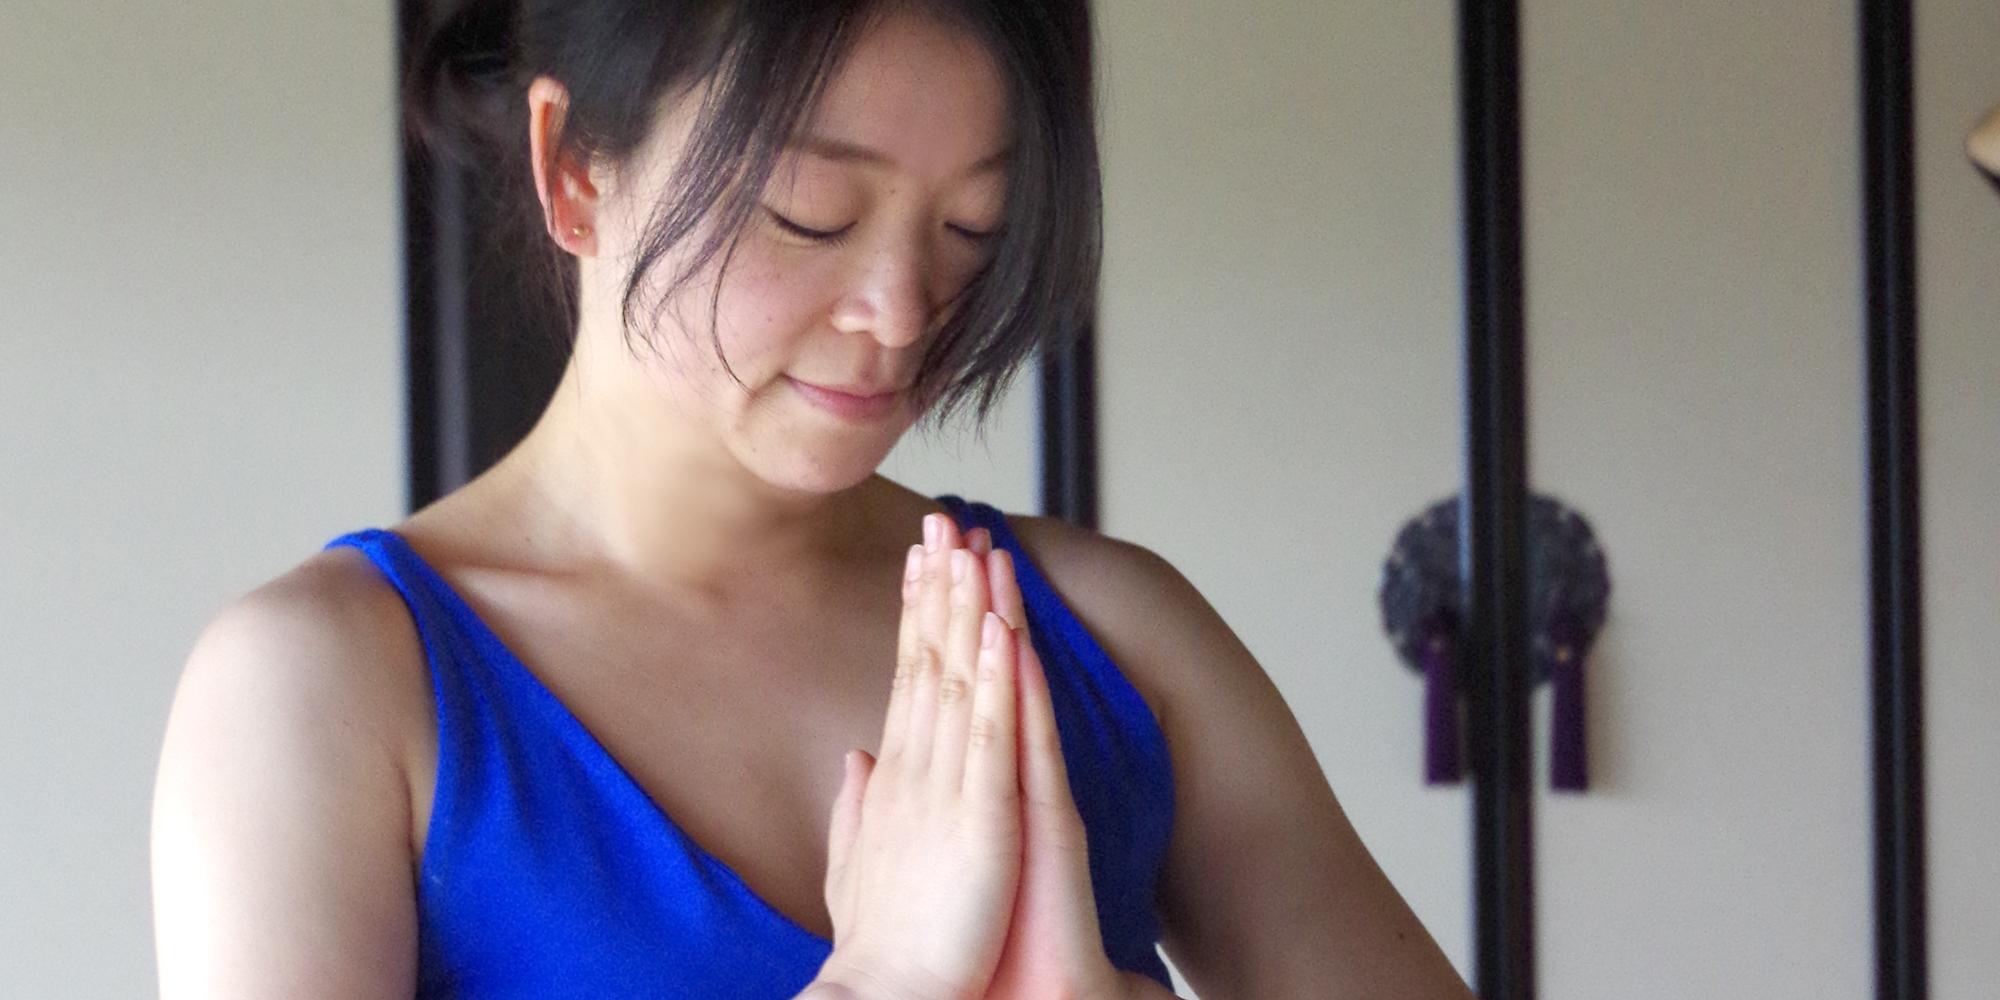 enura yoga studio (エヌラヨガスタジオ)|ヨガ-飯田市・高森町・松川町|パワーヨガを中心とした少人数・予約制のヨガレッスンです。